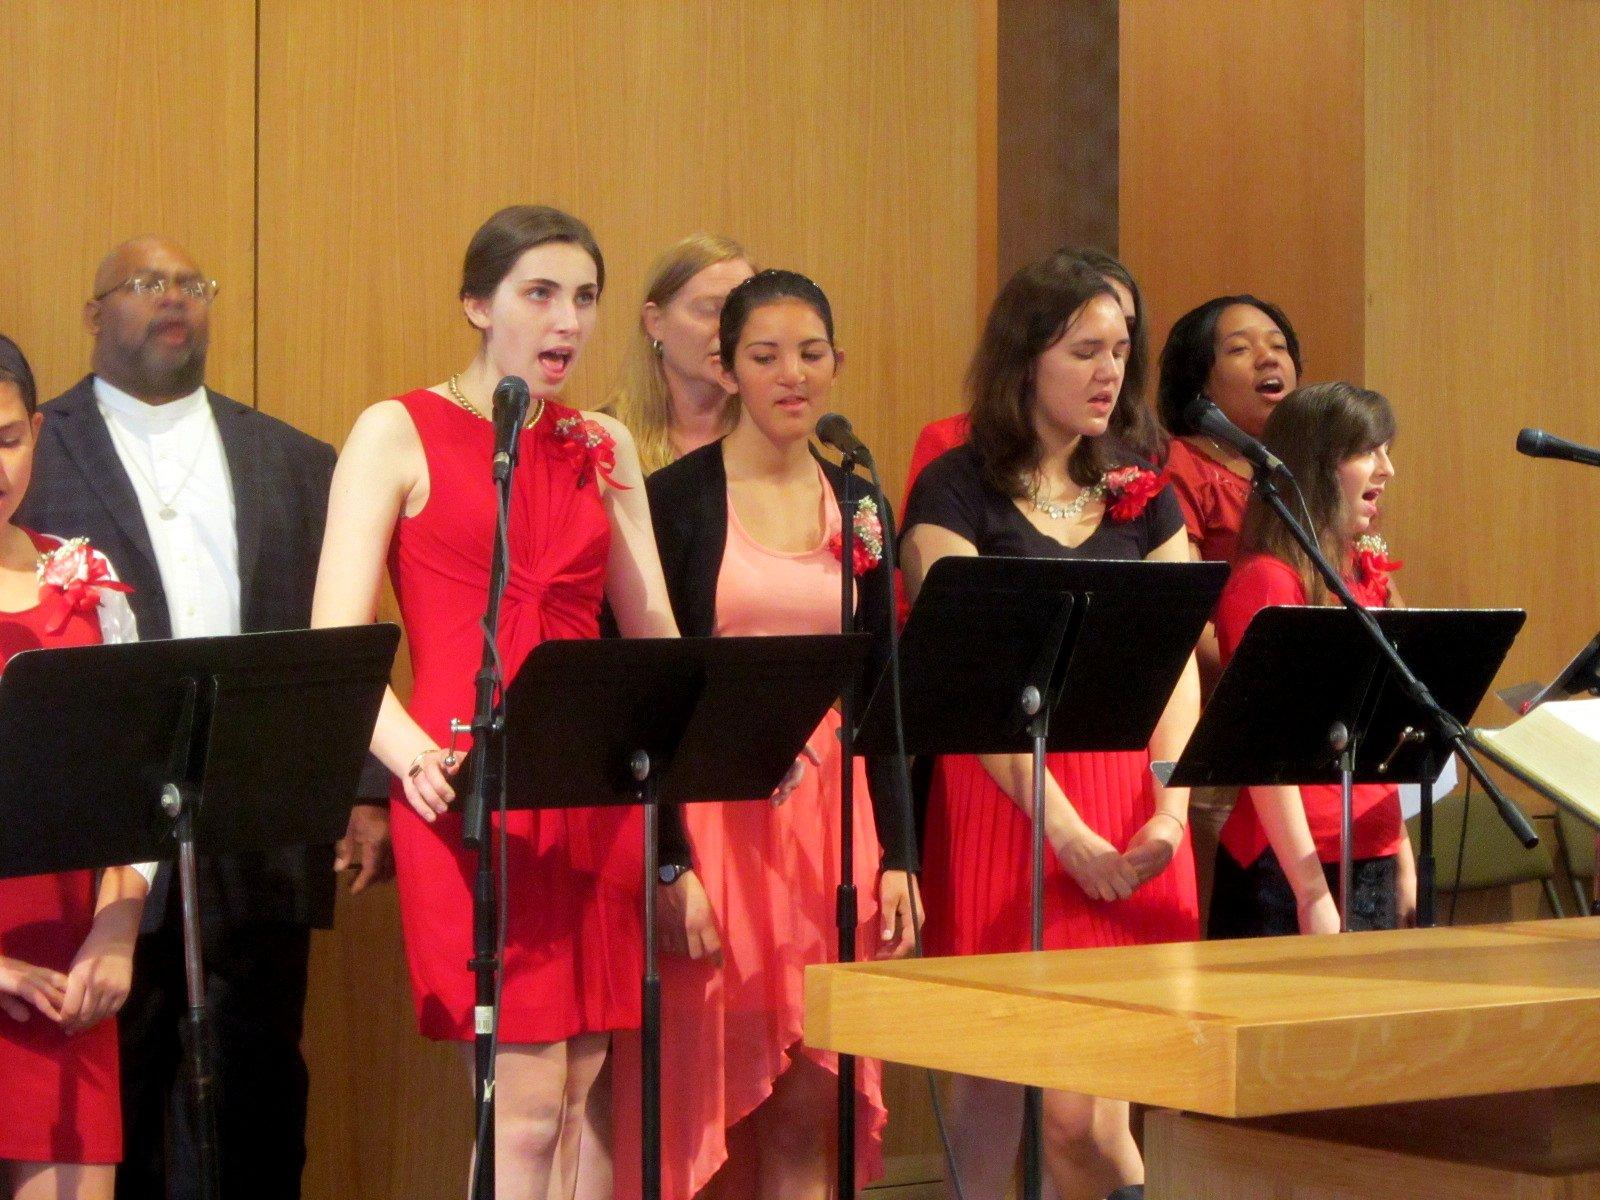 Youth-led worship for Pentecost